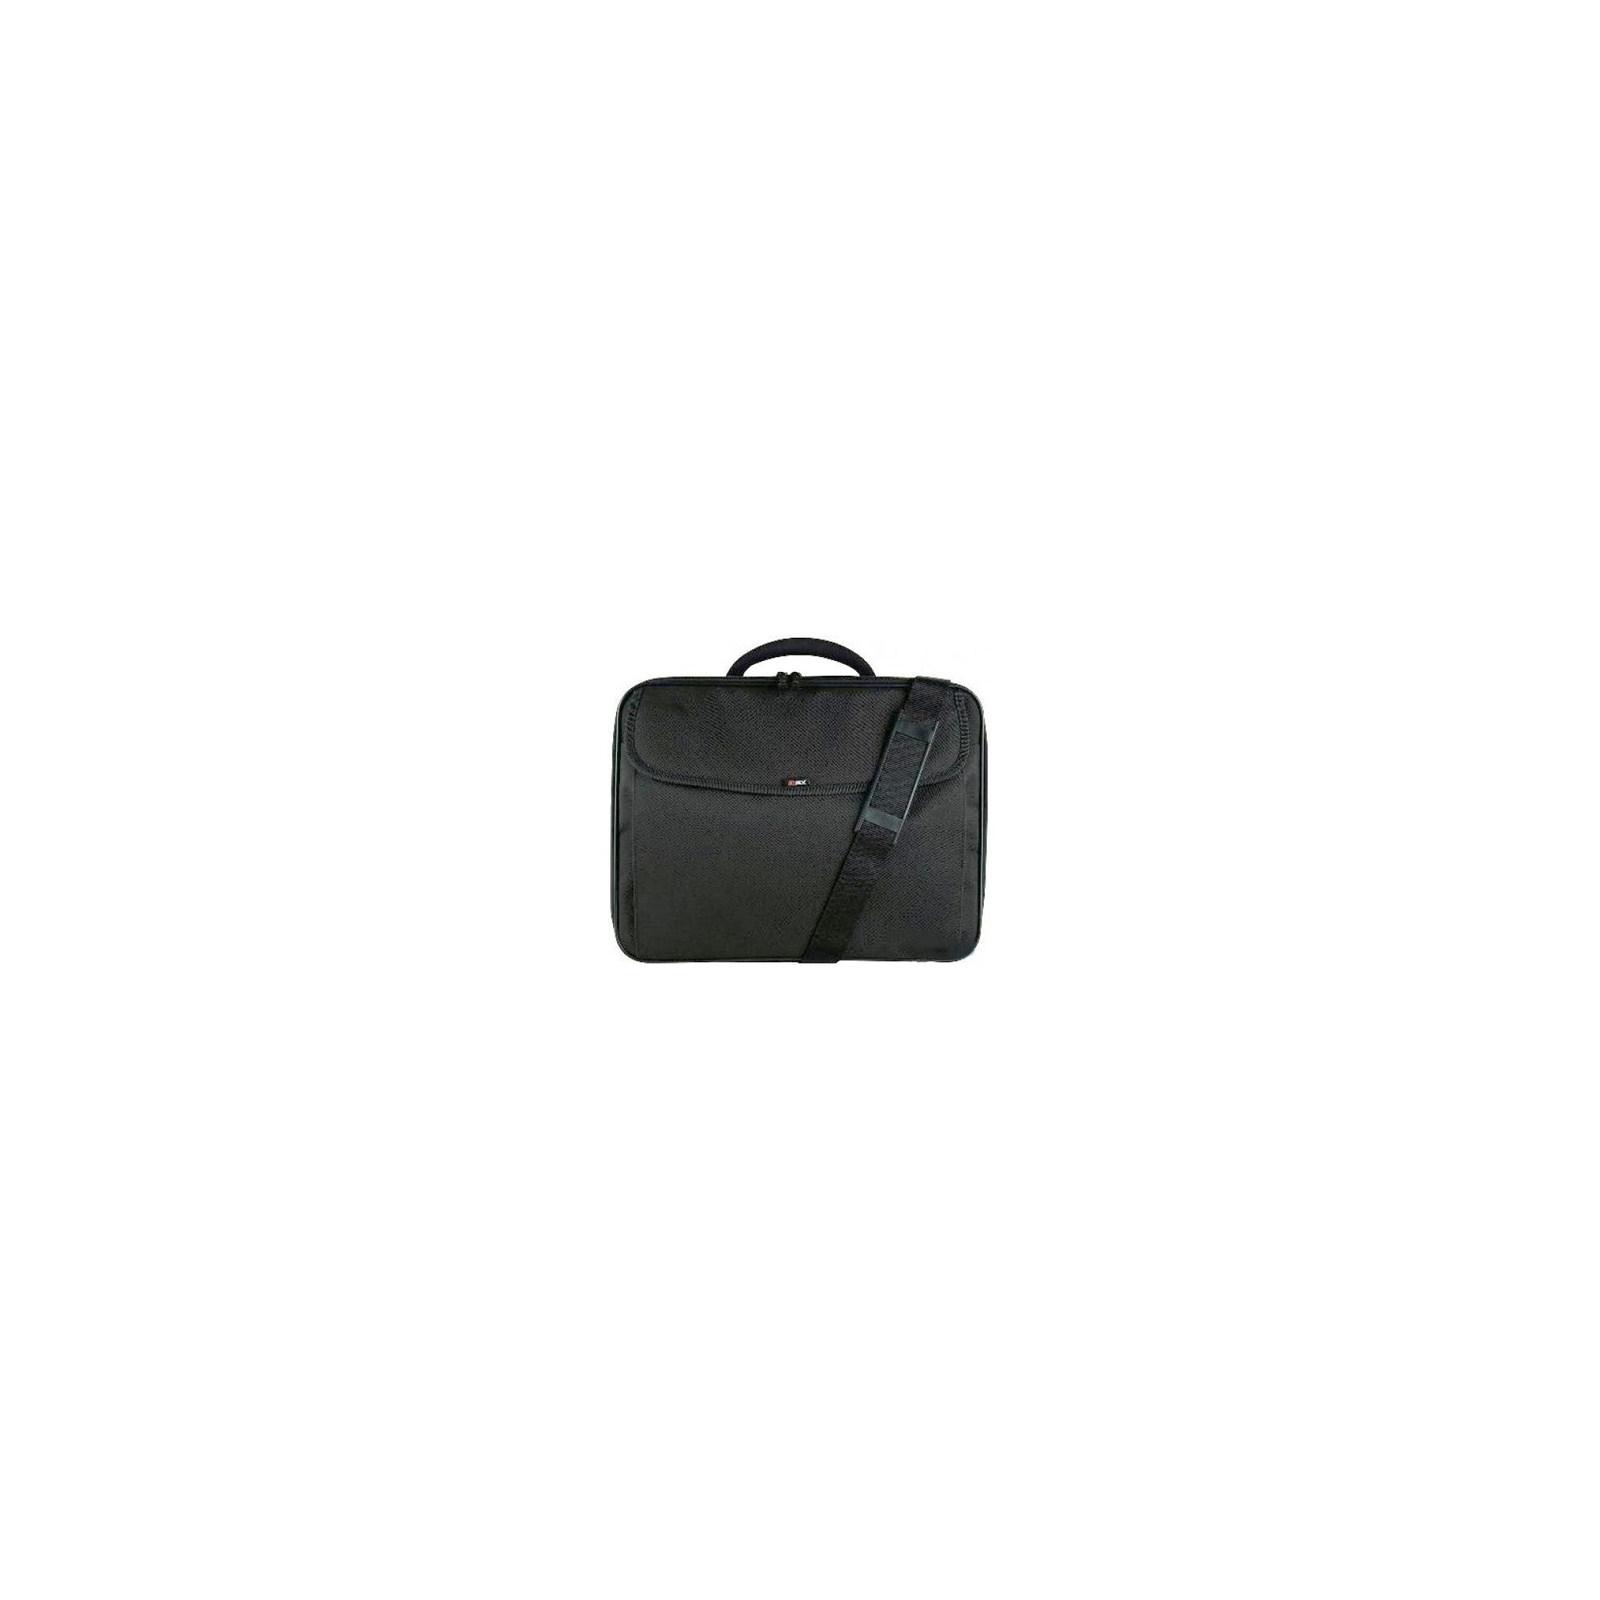 "Сумка для ноутбука Lex 17"" (LX-089P17-BK/LX-089PF17-BK/LX089PF-BK)"